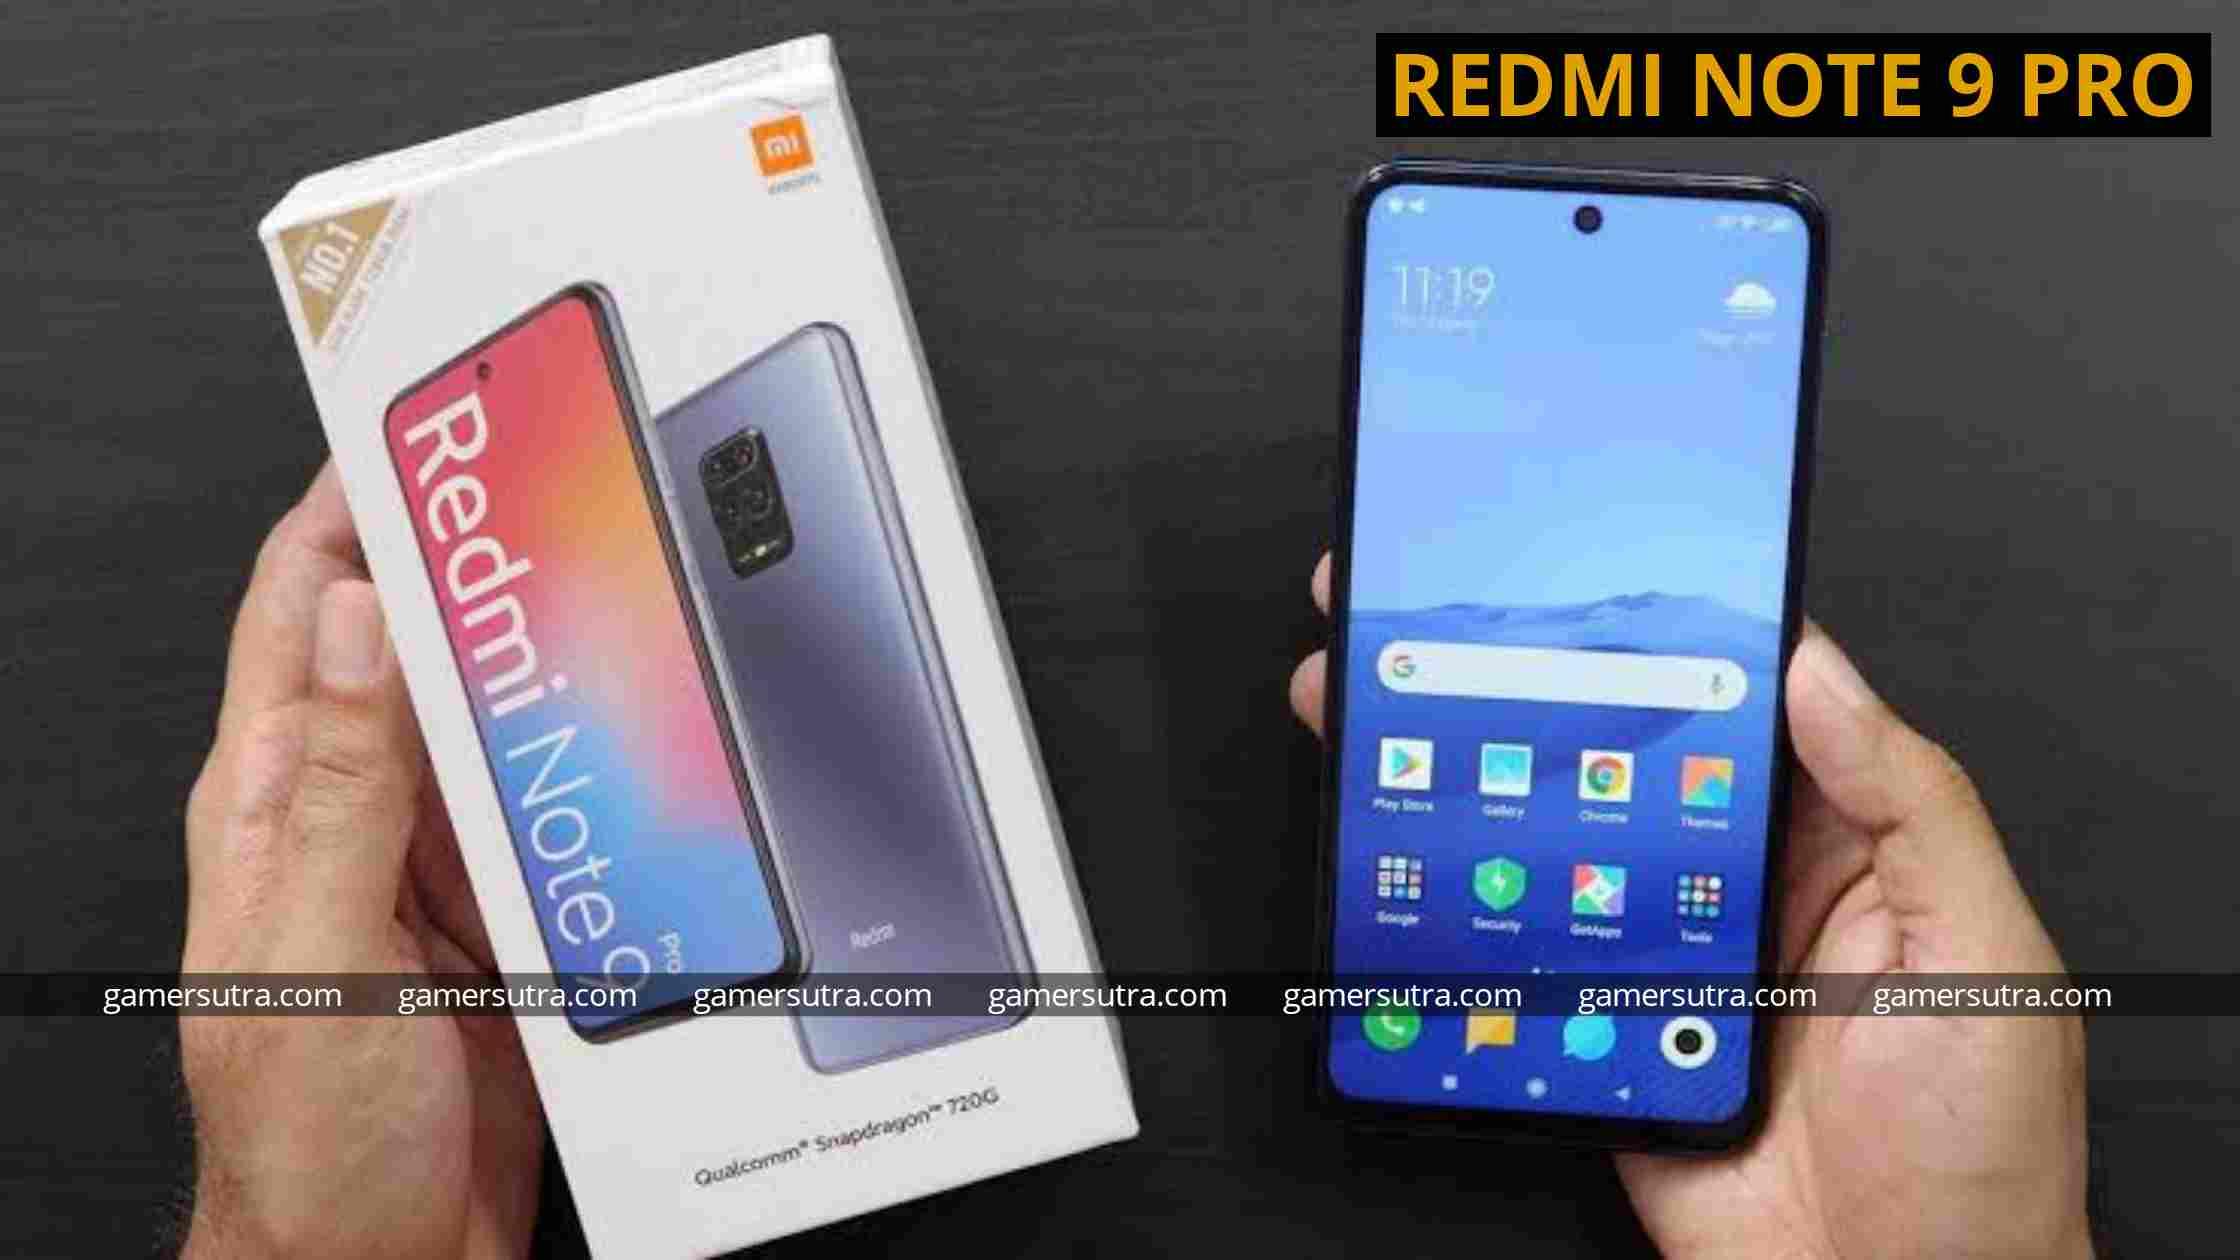 Redmi Note 9 pro - best Gaming phones under 15000